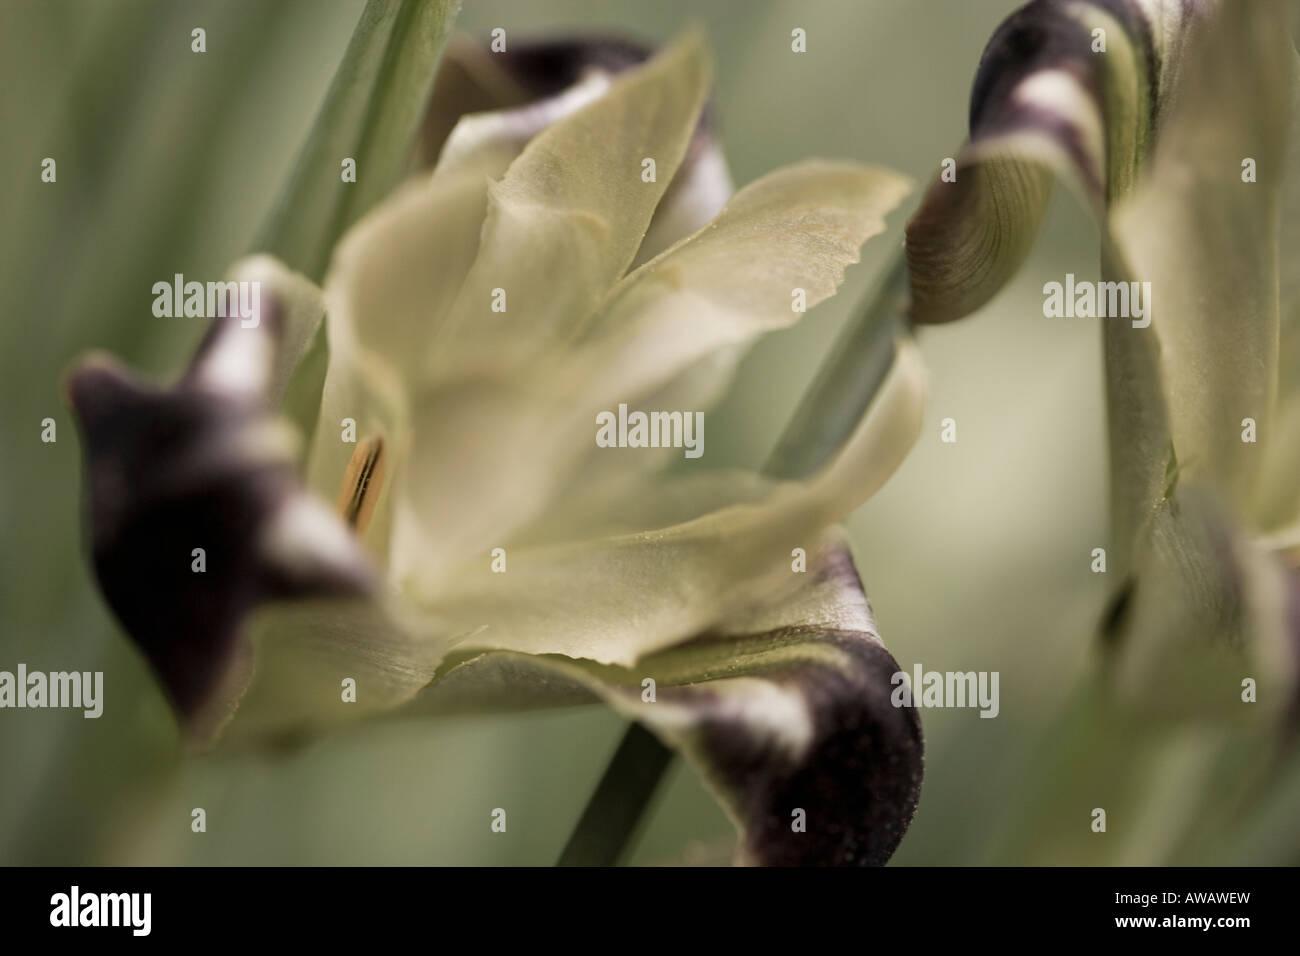 Macro of a Iris - Stock Image